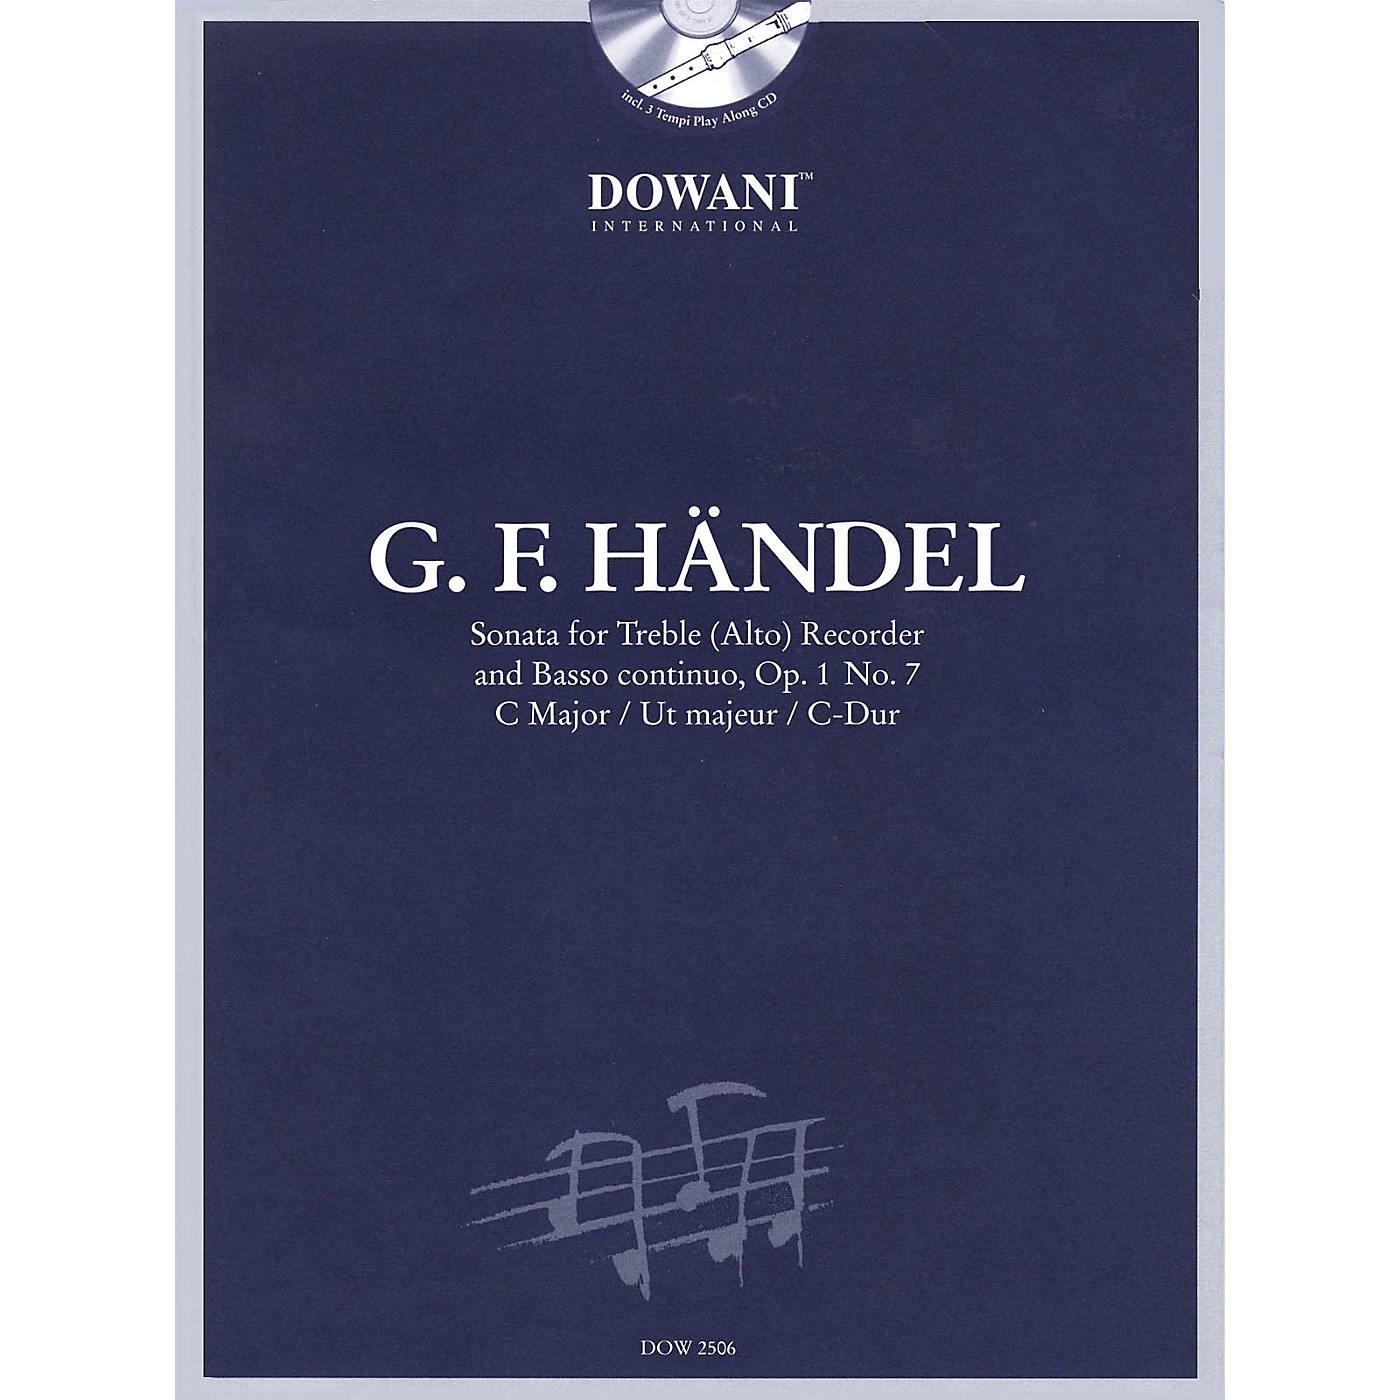 Dowani Editions Handel: Sonata in C Major, Op. 1, No. 7 for Treble (Alto) Recorder and Basso Continuo Dowani Book/CD thumbnail